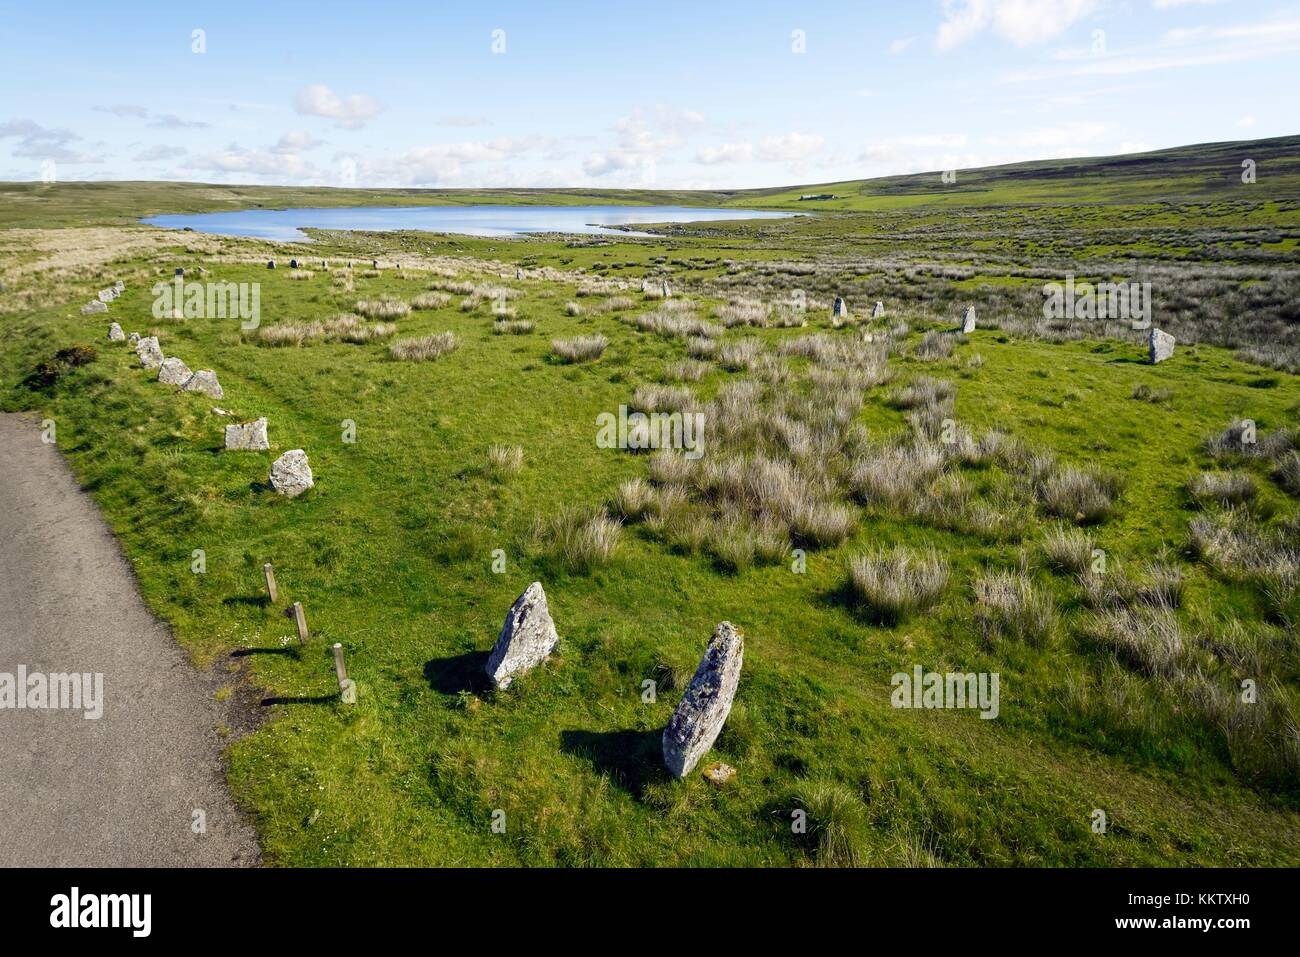 Achavanich Stone Setting 4000 year prehistoric U shaped stone alignments. Lybster, Caithness, Scotland - Stock Image